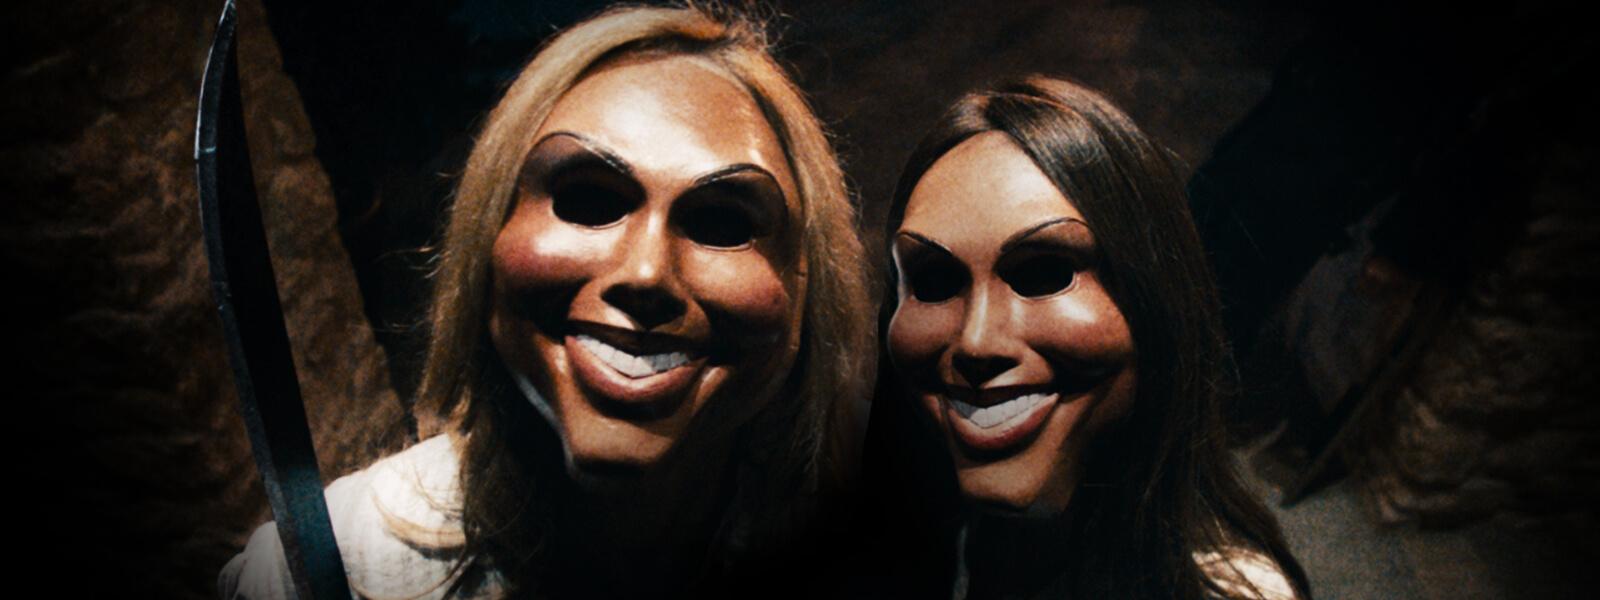 purge-2013-movie